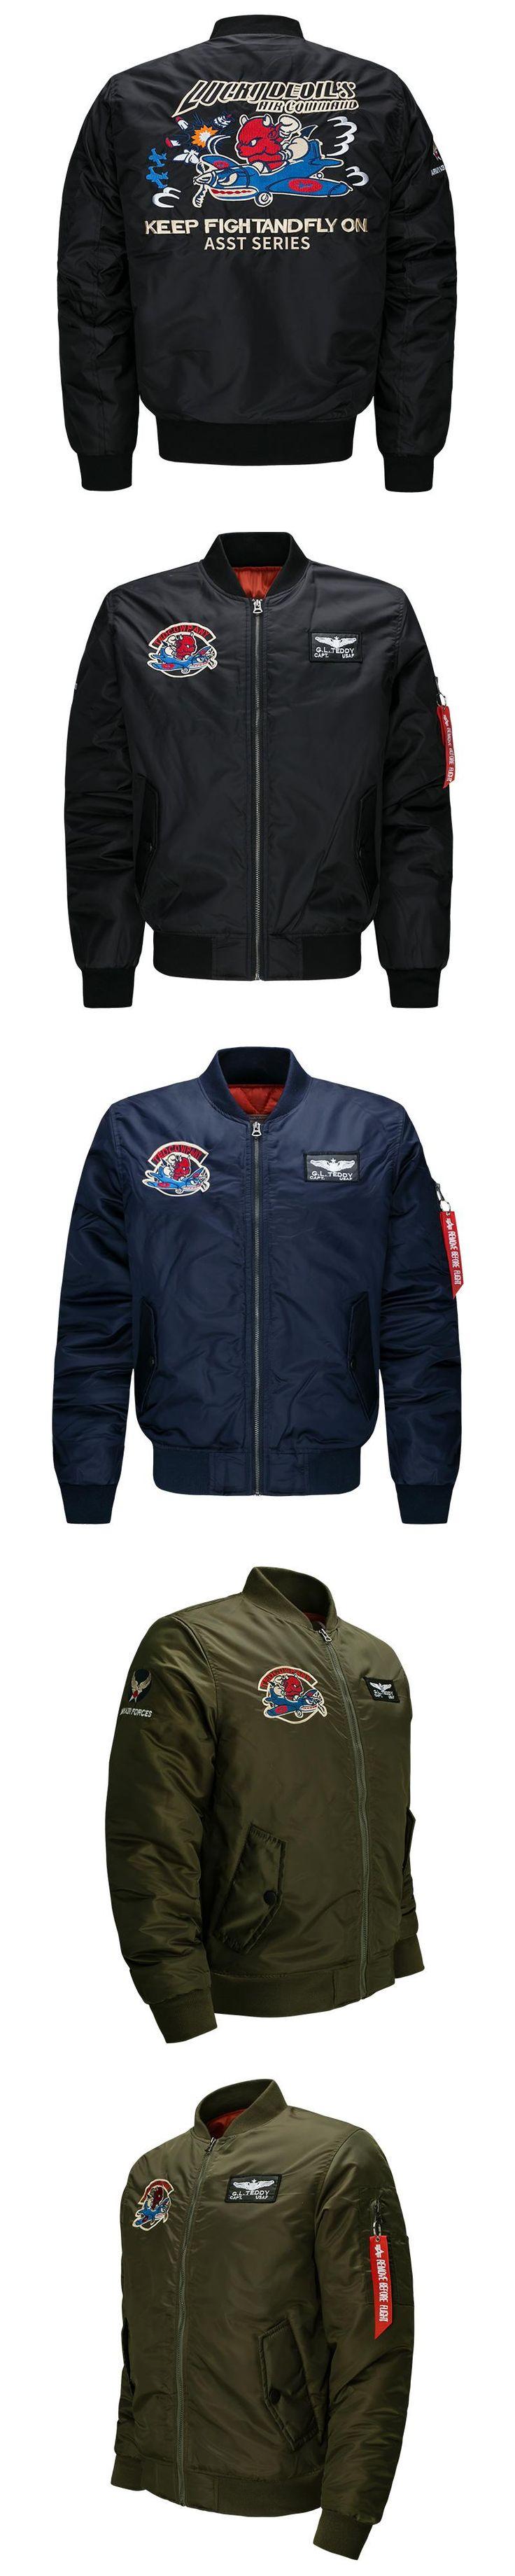 Bomber Jacket Men 2017 Ma-1 Army Green Flight Jacket Pilot Air Force Mens Ma1 Military motorcycle Jackets Coats